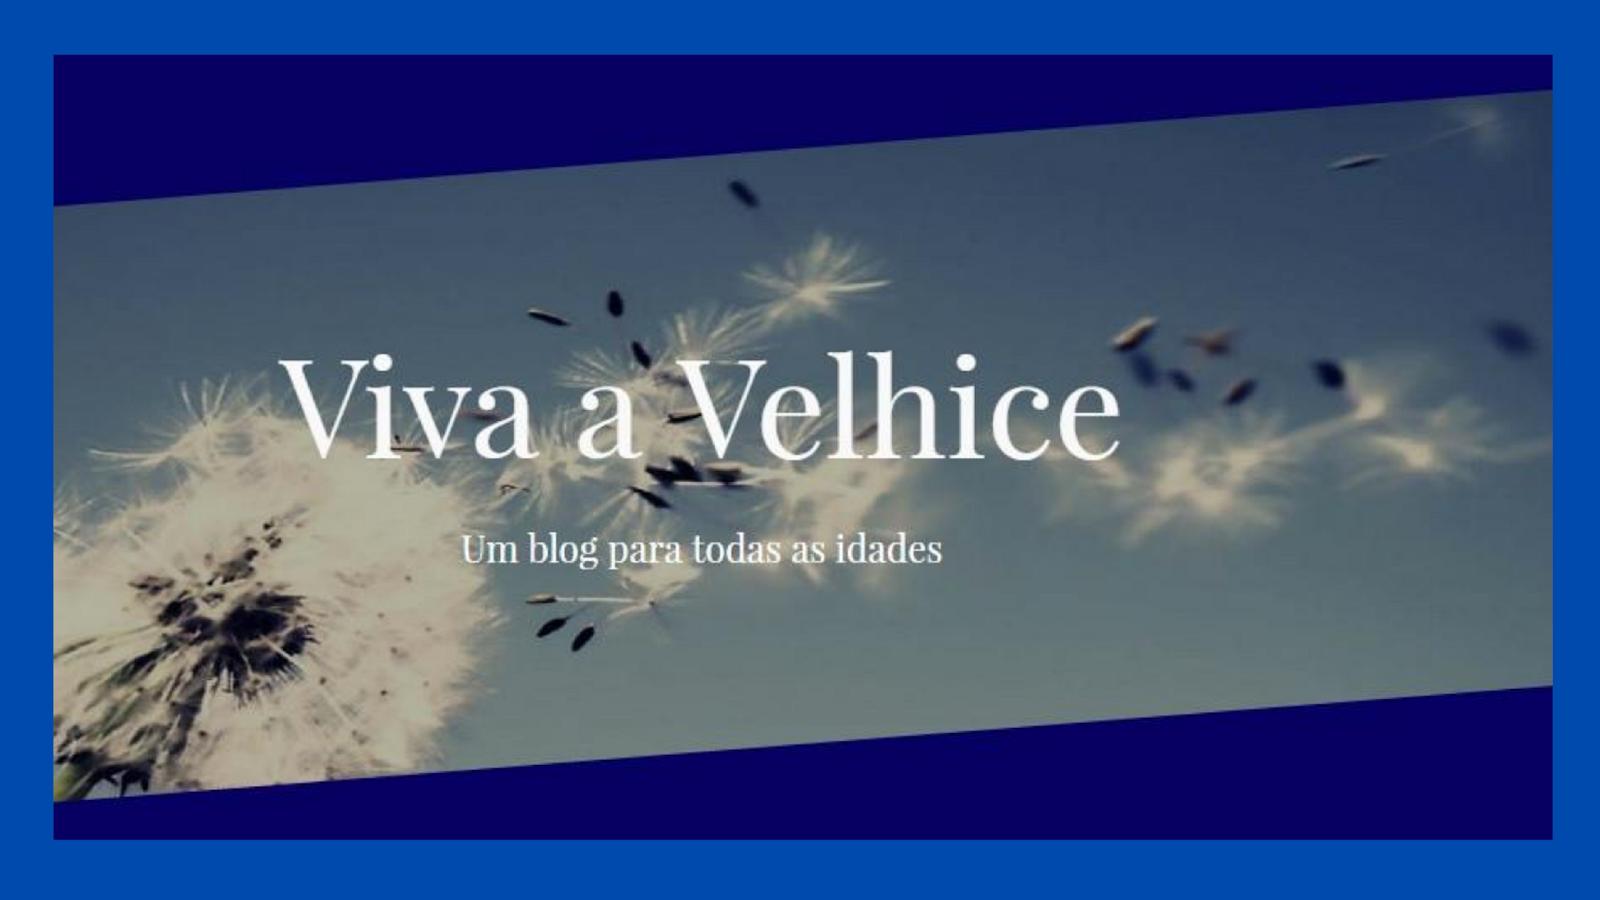 www.vivaavelhice.com.br